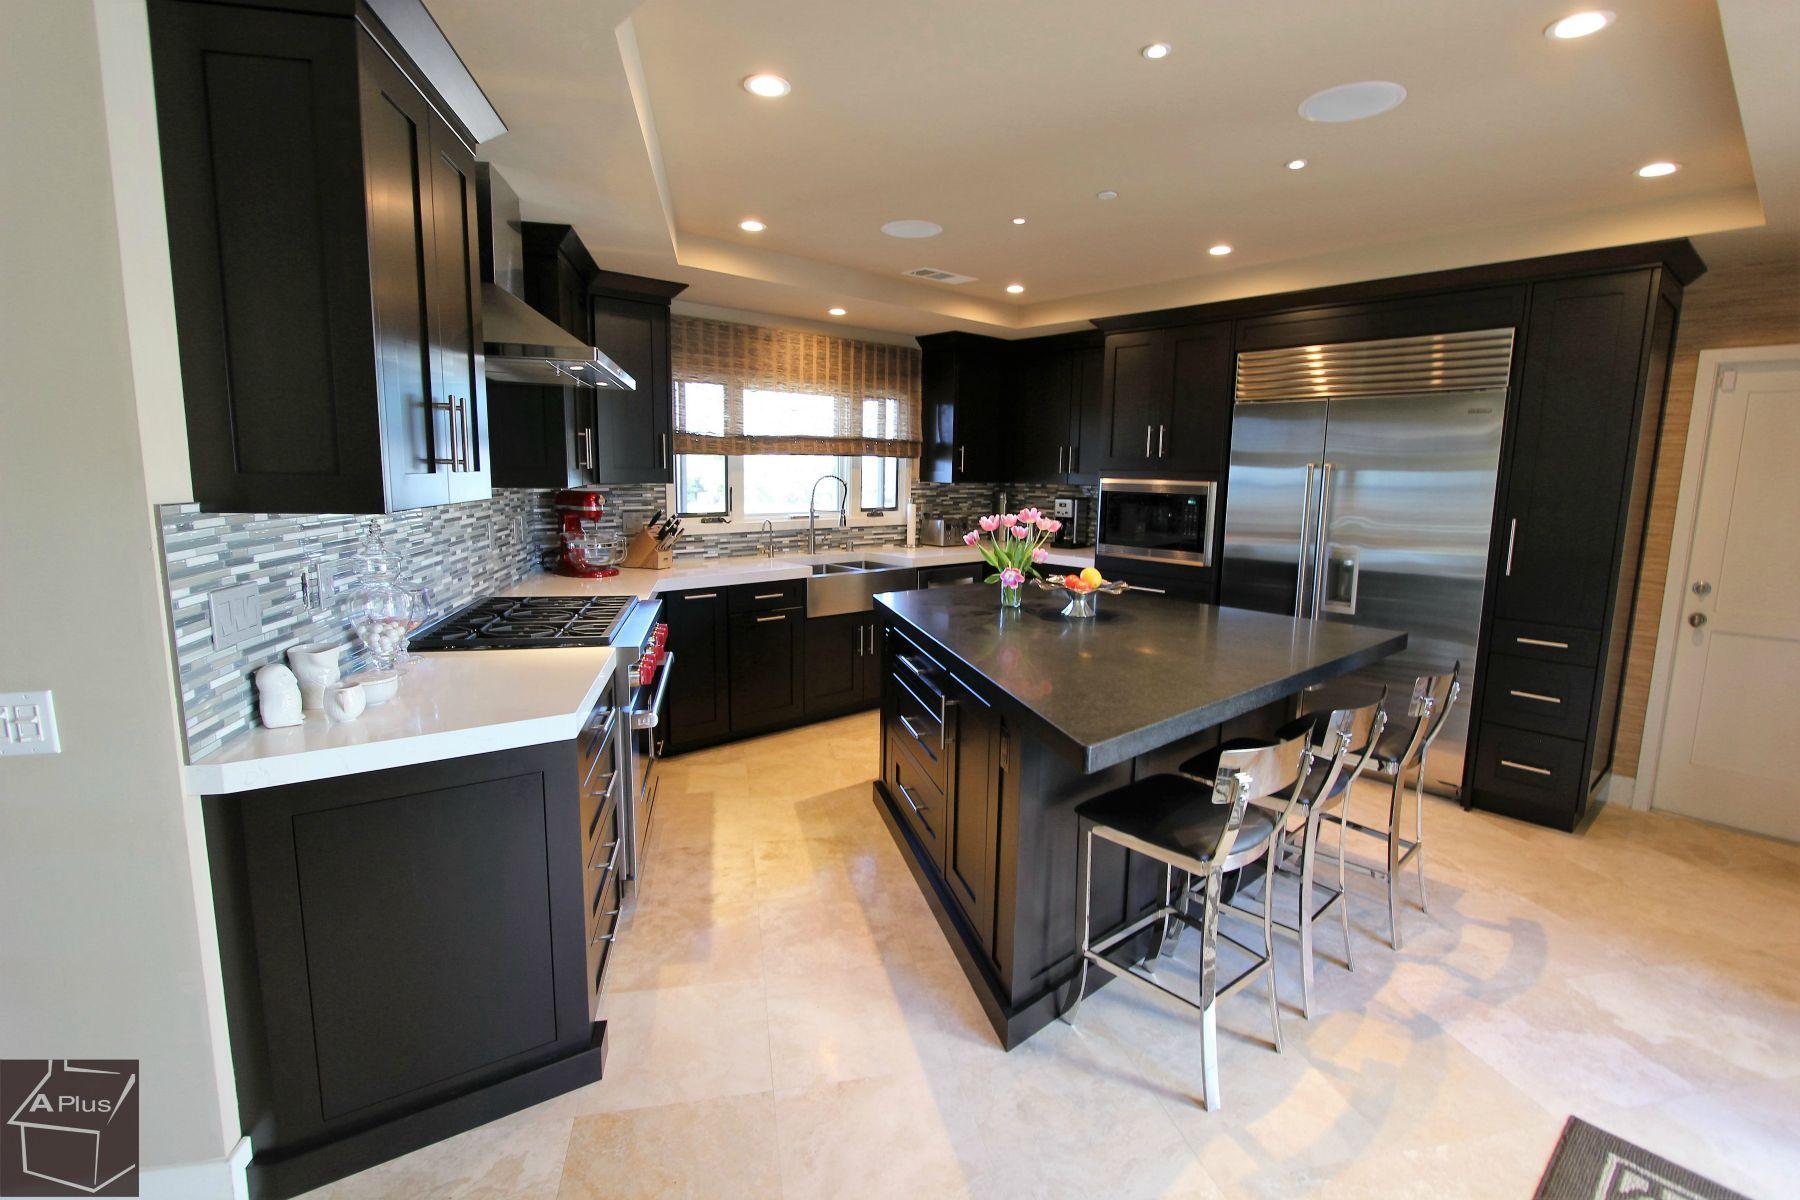 Design Build Transitional Kitchen Remodel In Dana Point Orange County